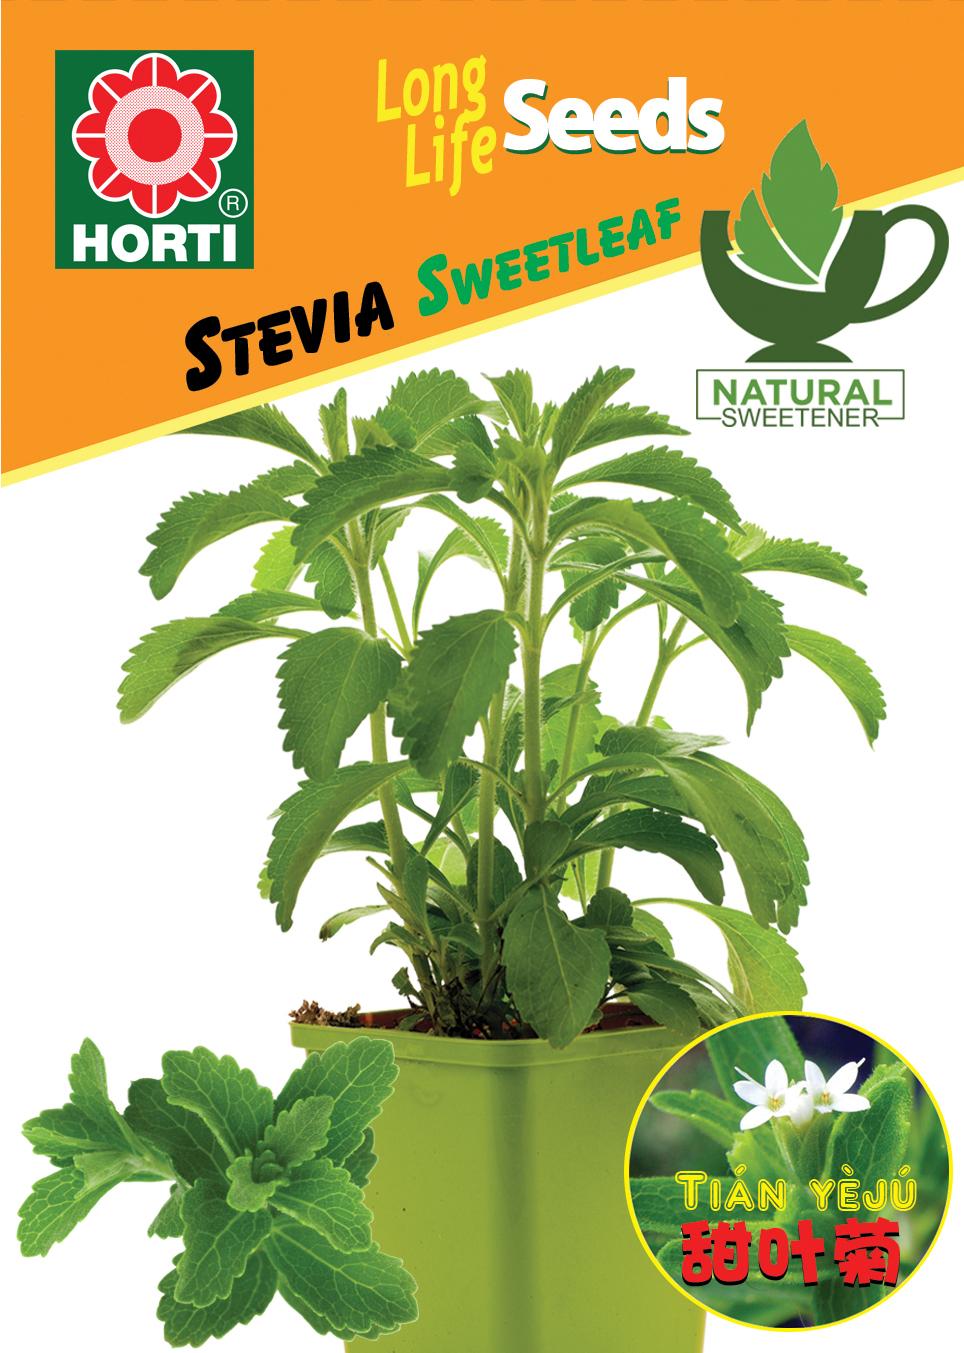 Horti Flora Singapore Seeds Supplier